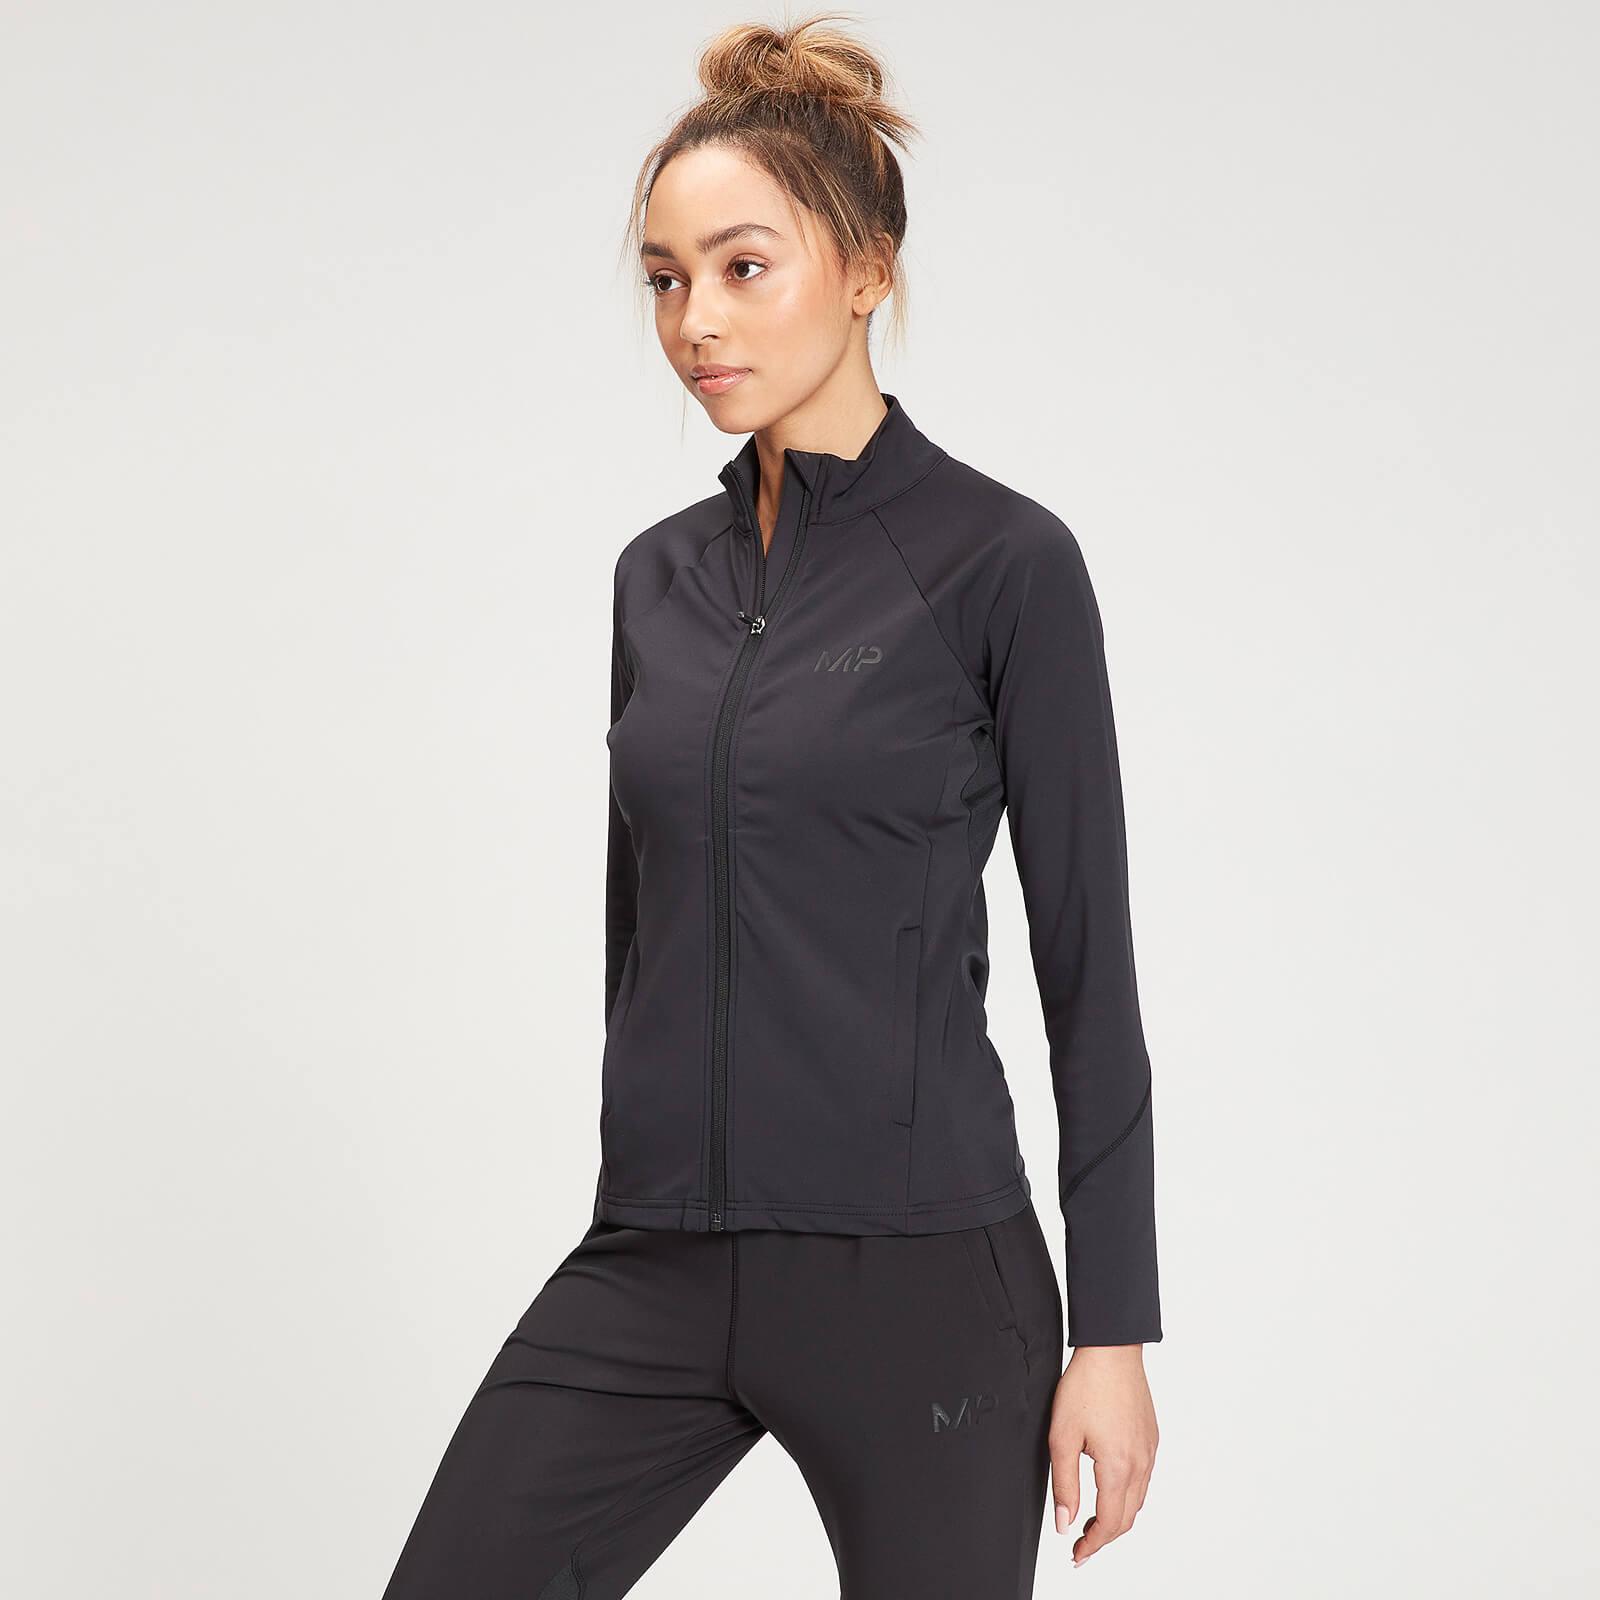 MP Women's Agility Training Jacket - Black - XXS, Myprotein International  - купить со скидкой